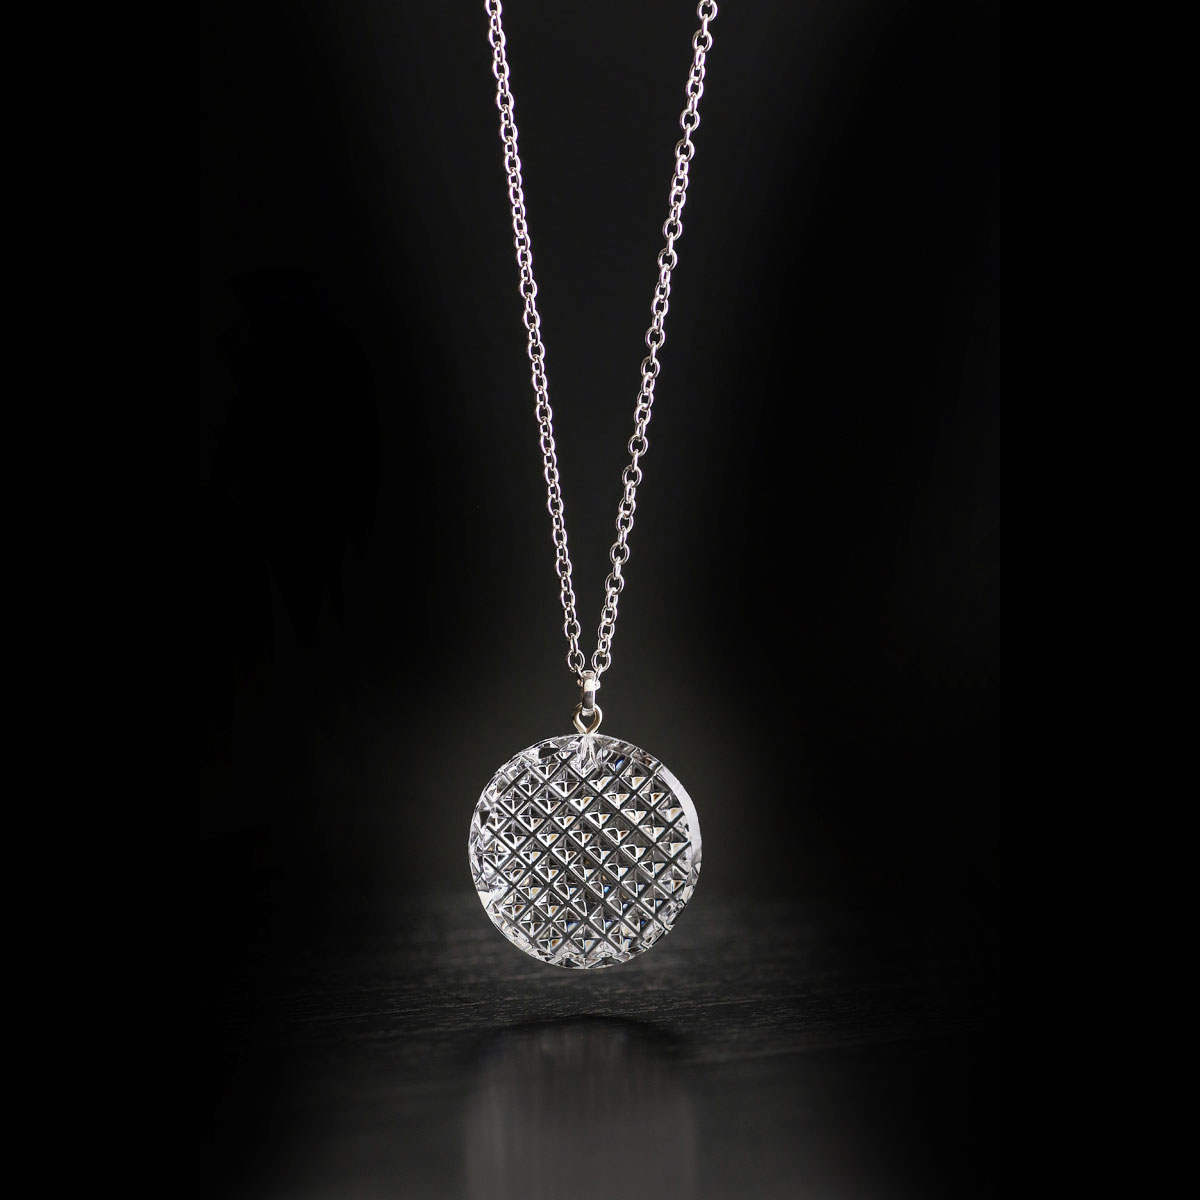 Cashs Ireland, Crystal Kerry Pendant Necklace, Medium